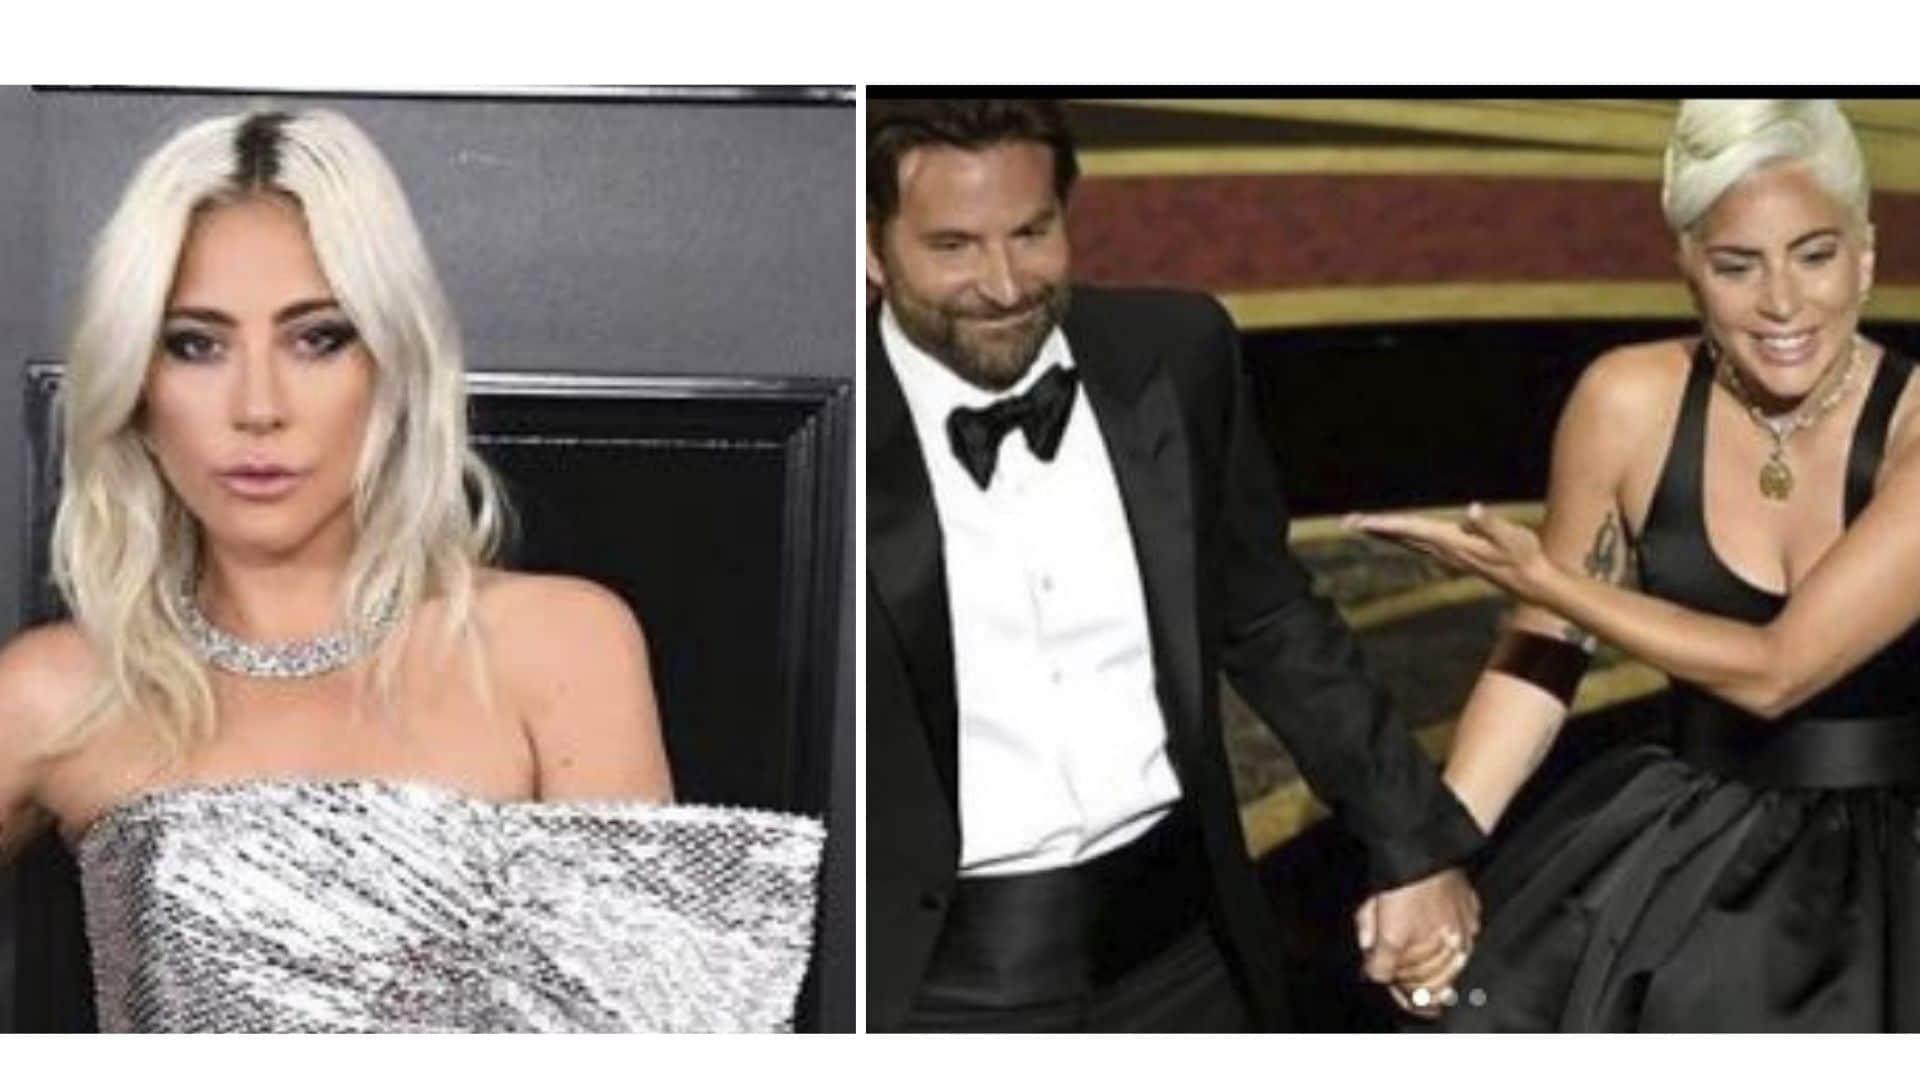 Svelato il motivo della rottura tra Bradley Cooper e Irina Shayk